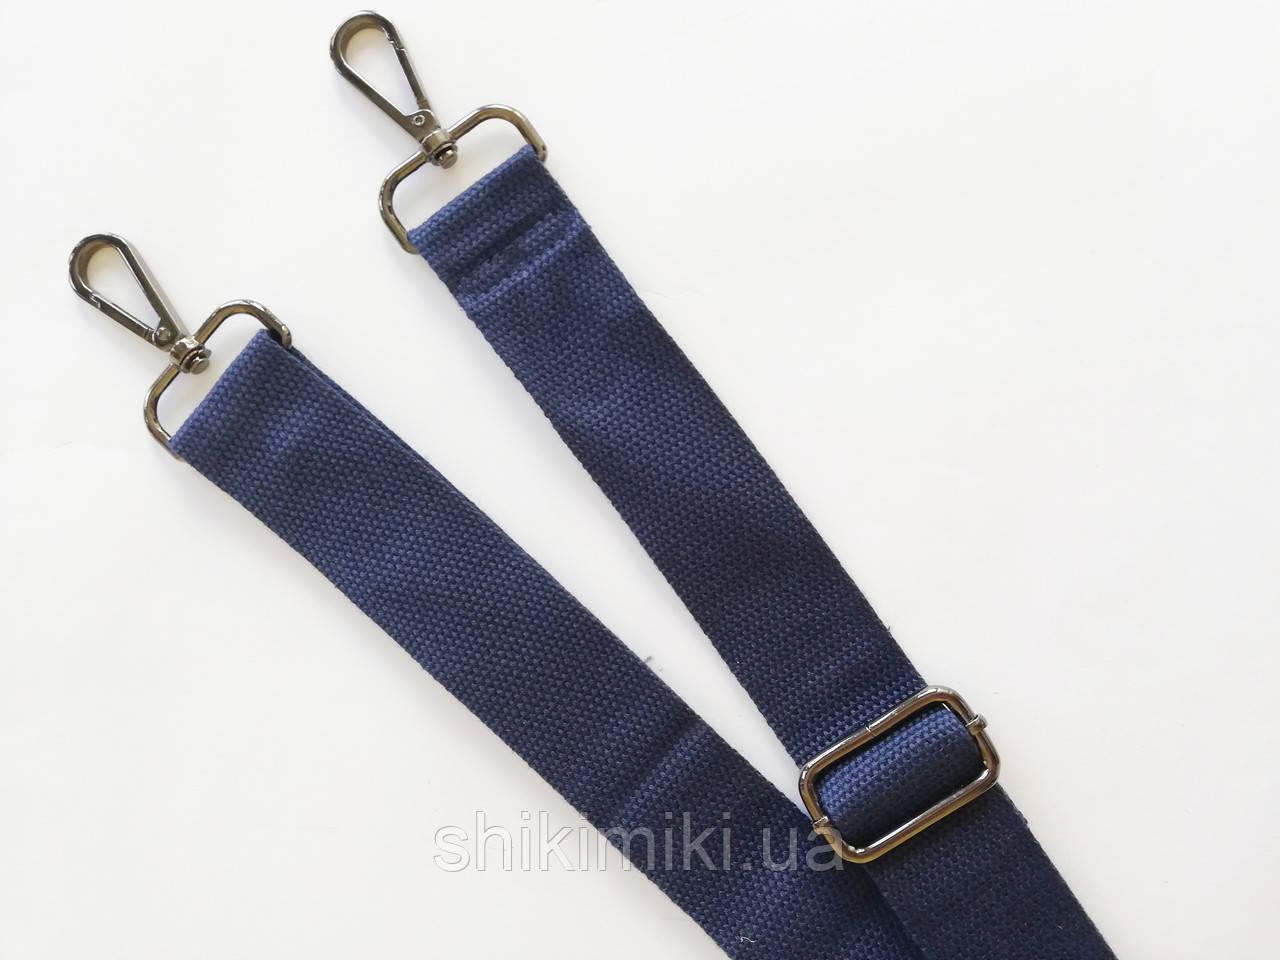 Плечевой ремень, темно-синий